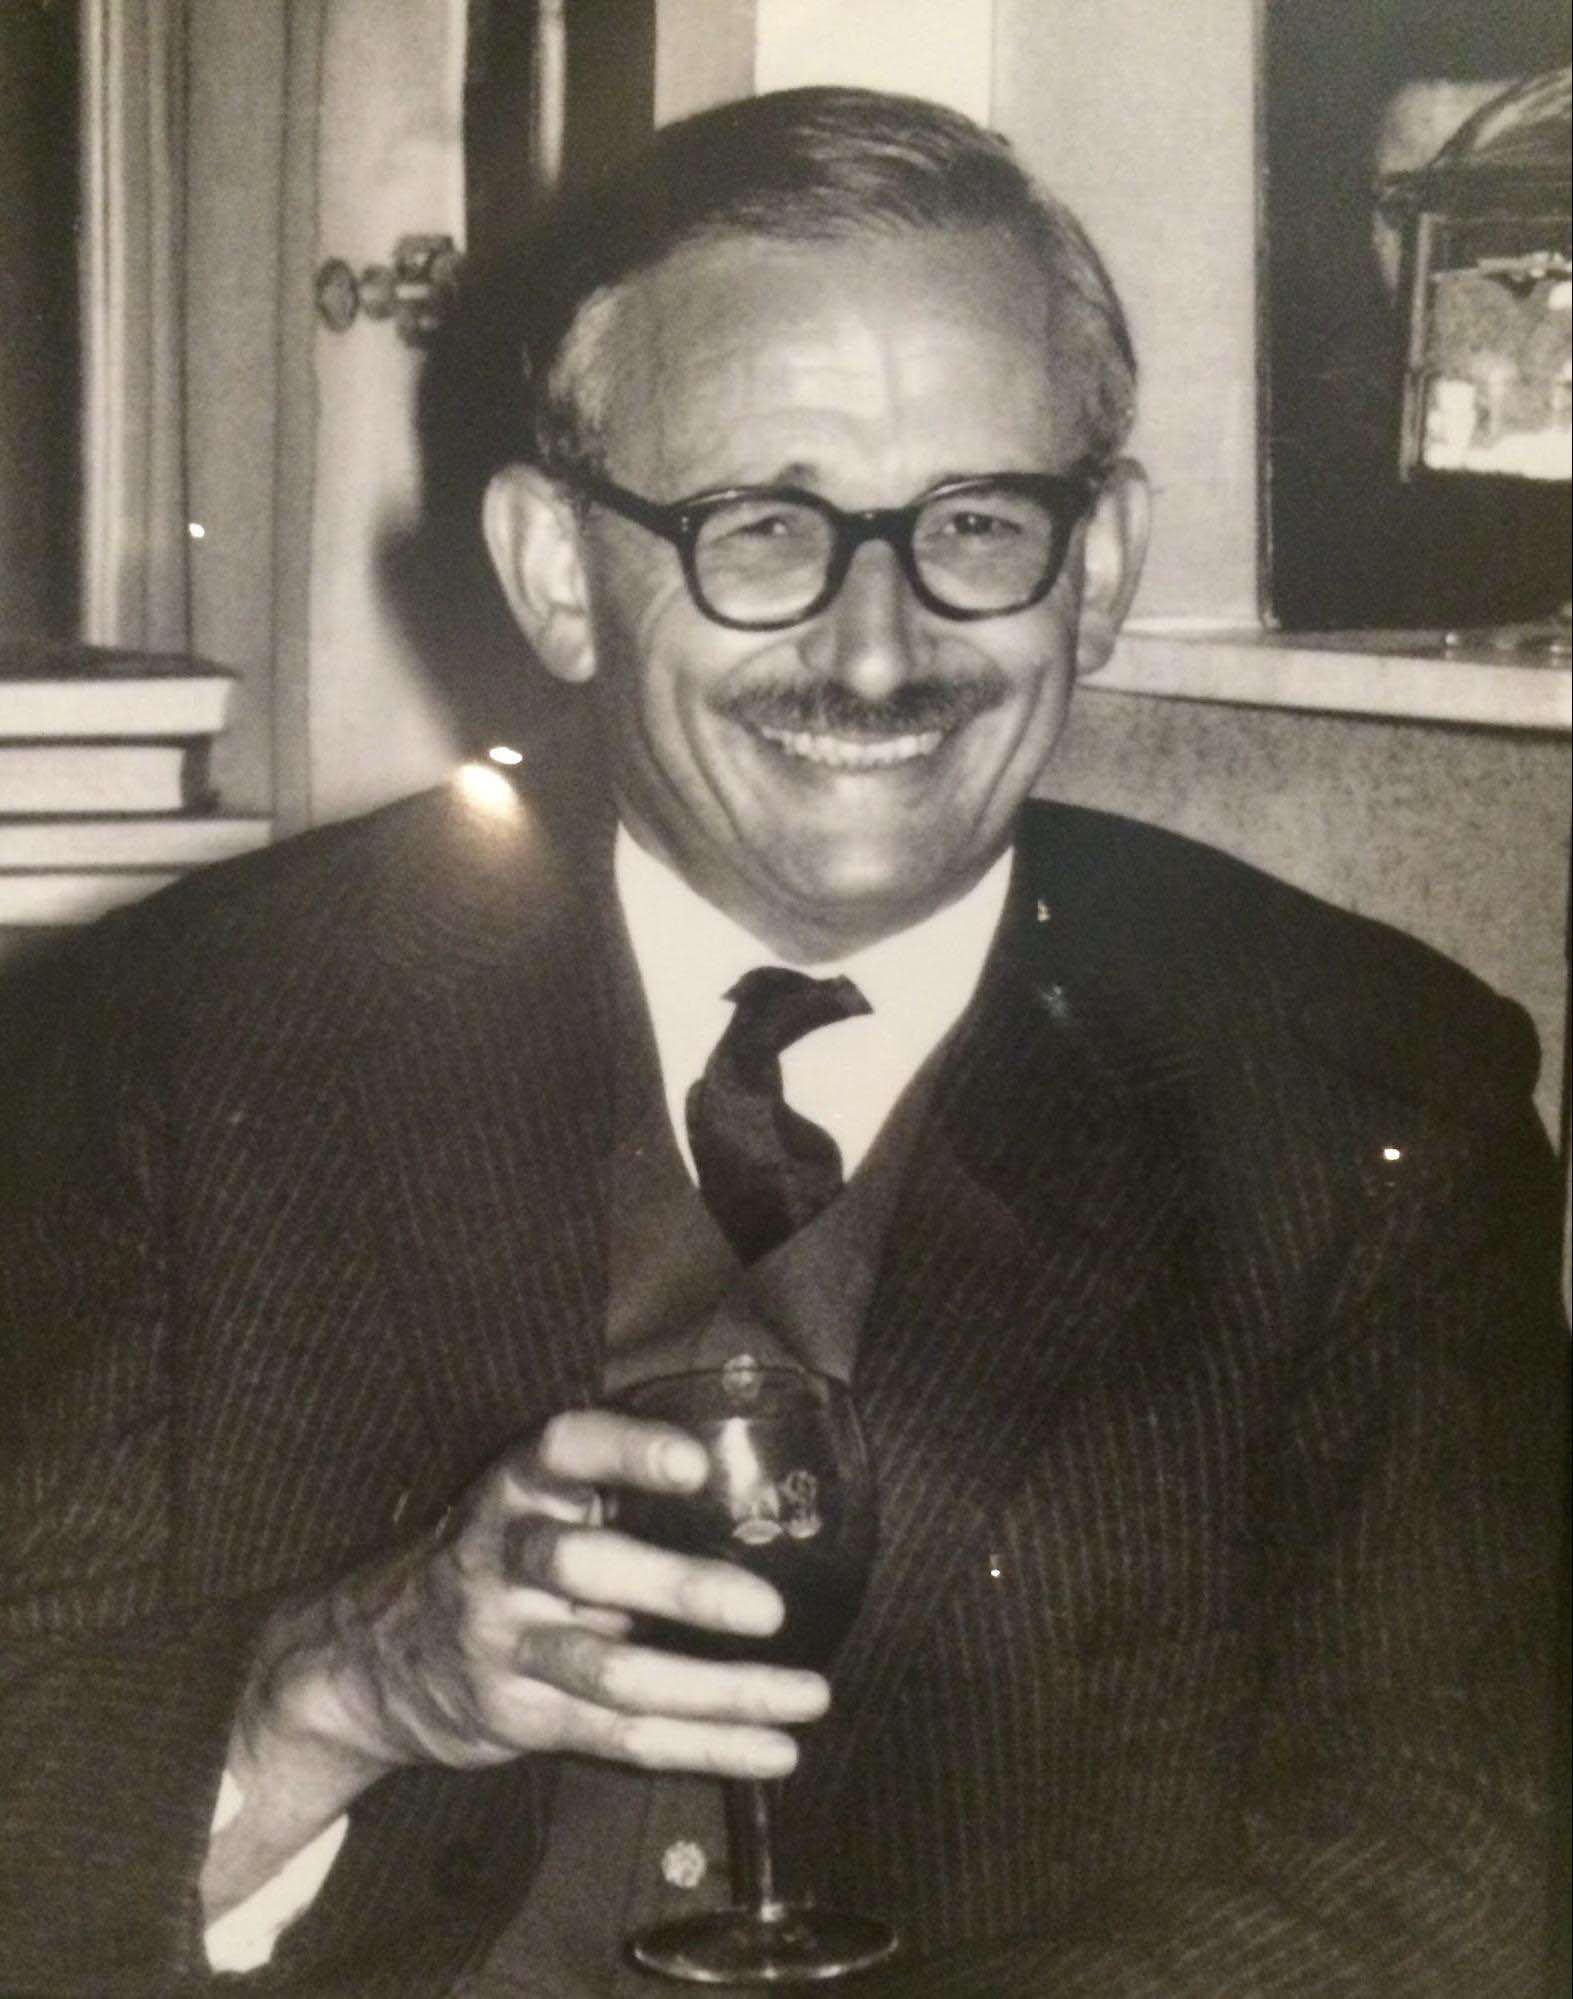 Samantha's grandfather